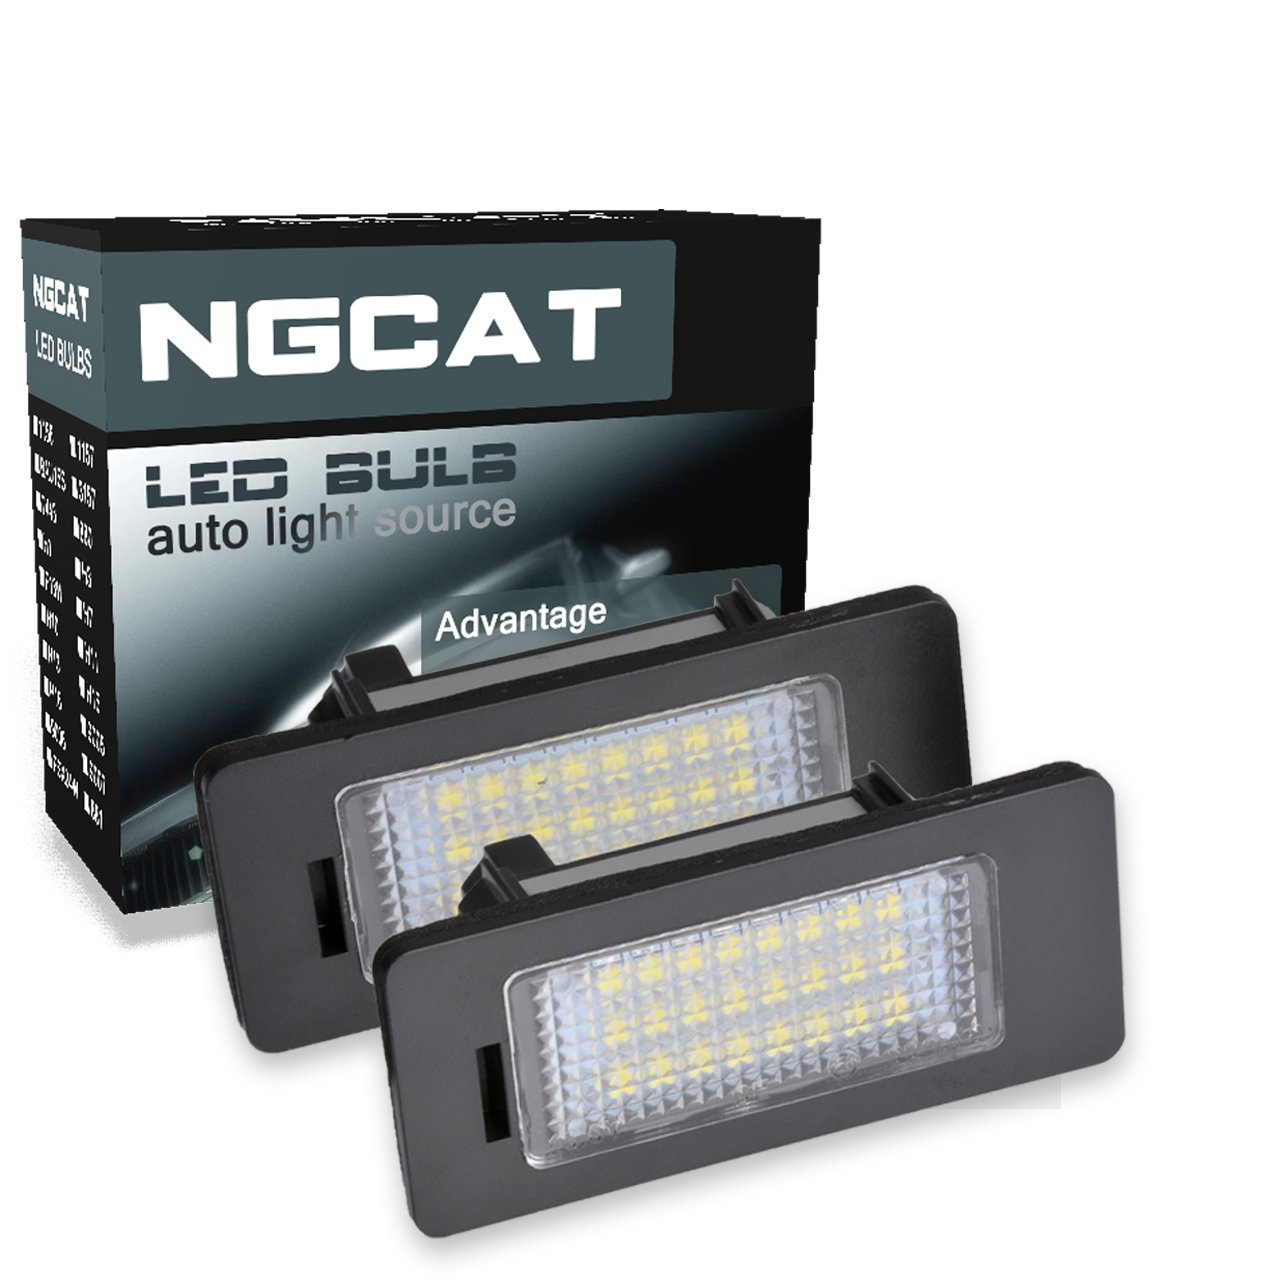 ngcat LED 3528 24 SMD Bombilla licencia número placa lámparas de luz para Canbus (Pack de 2)